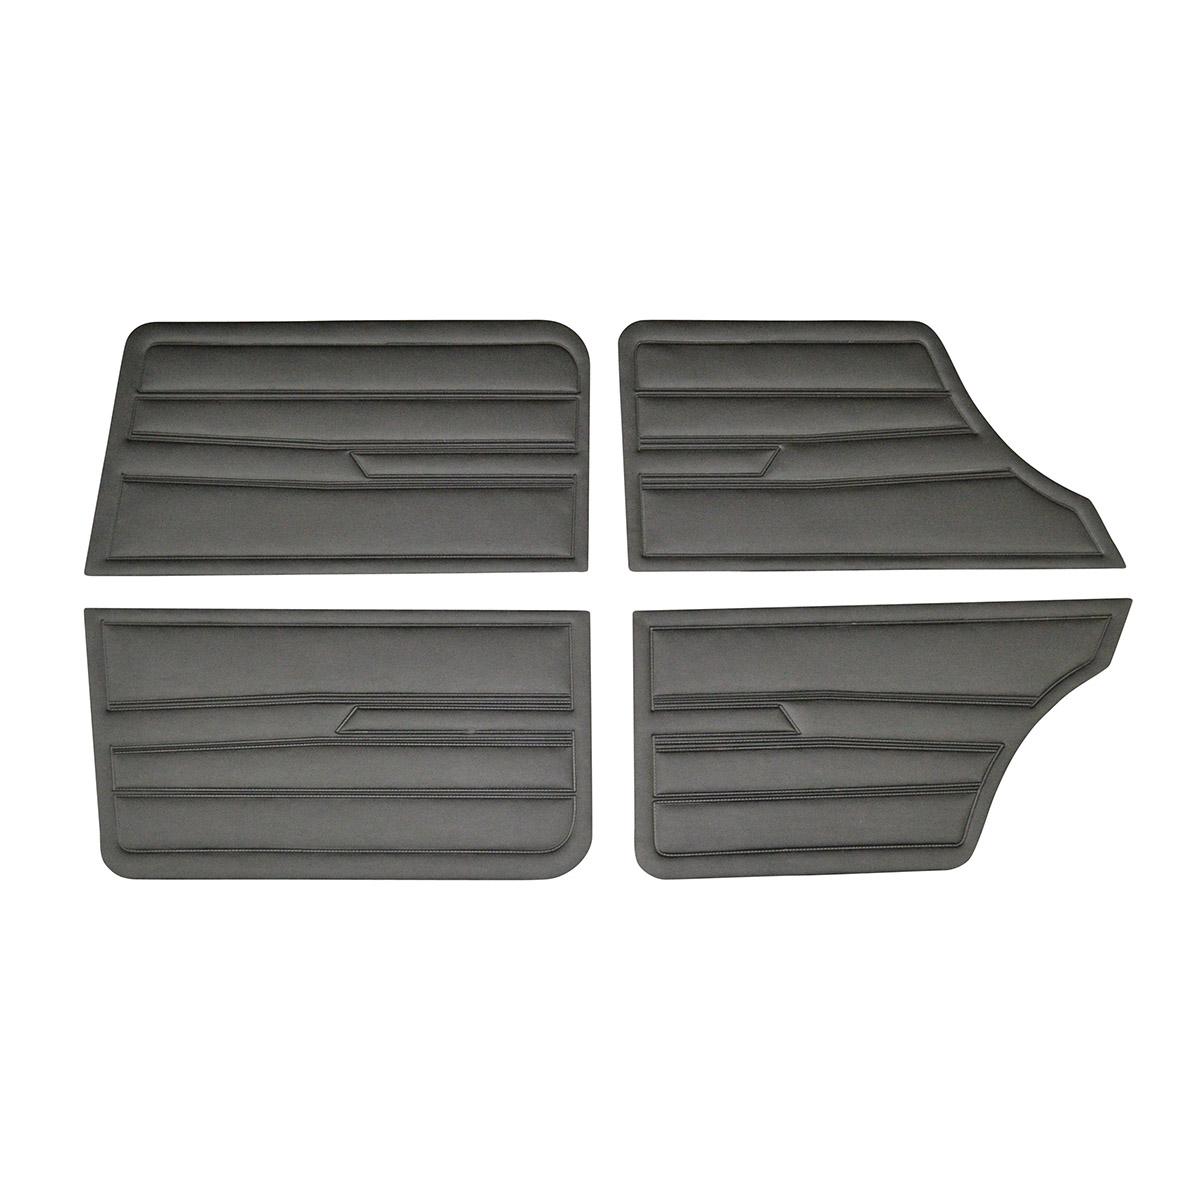 Tapicerki Boczne Czarne (Oem) VW Golf 1 (4D)